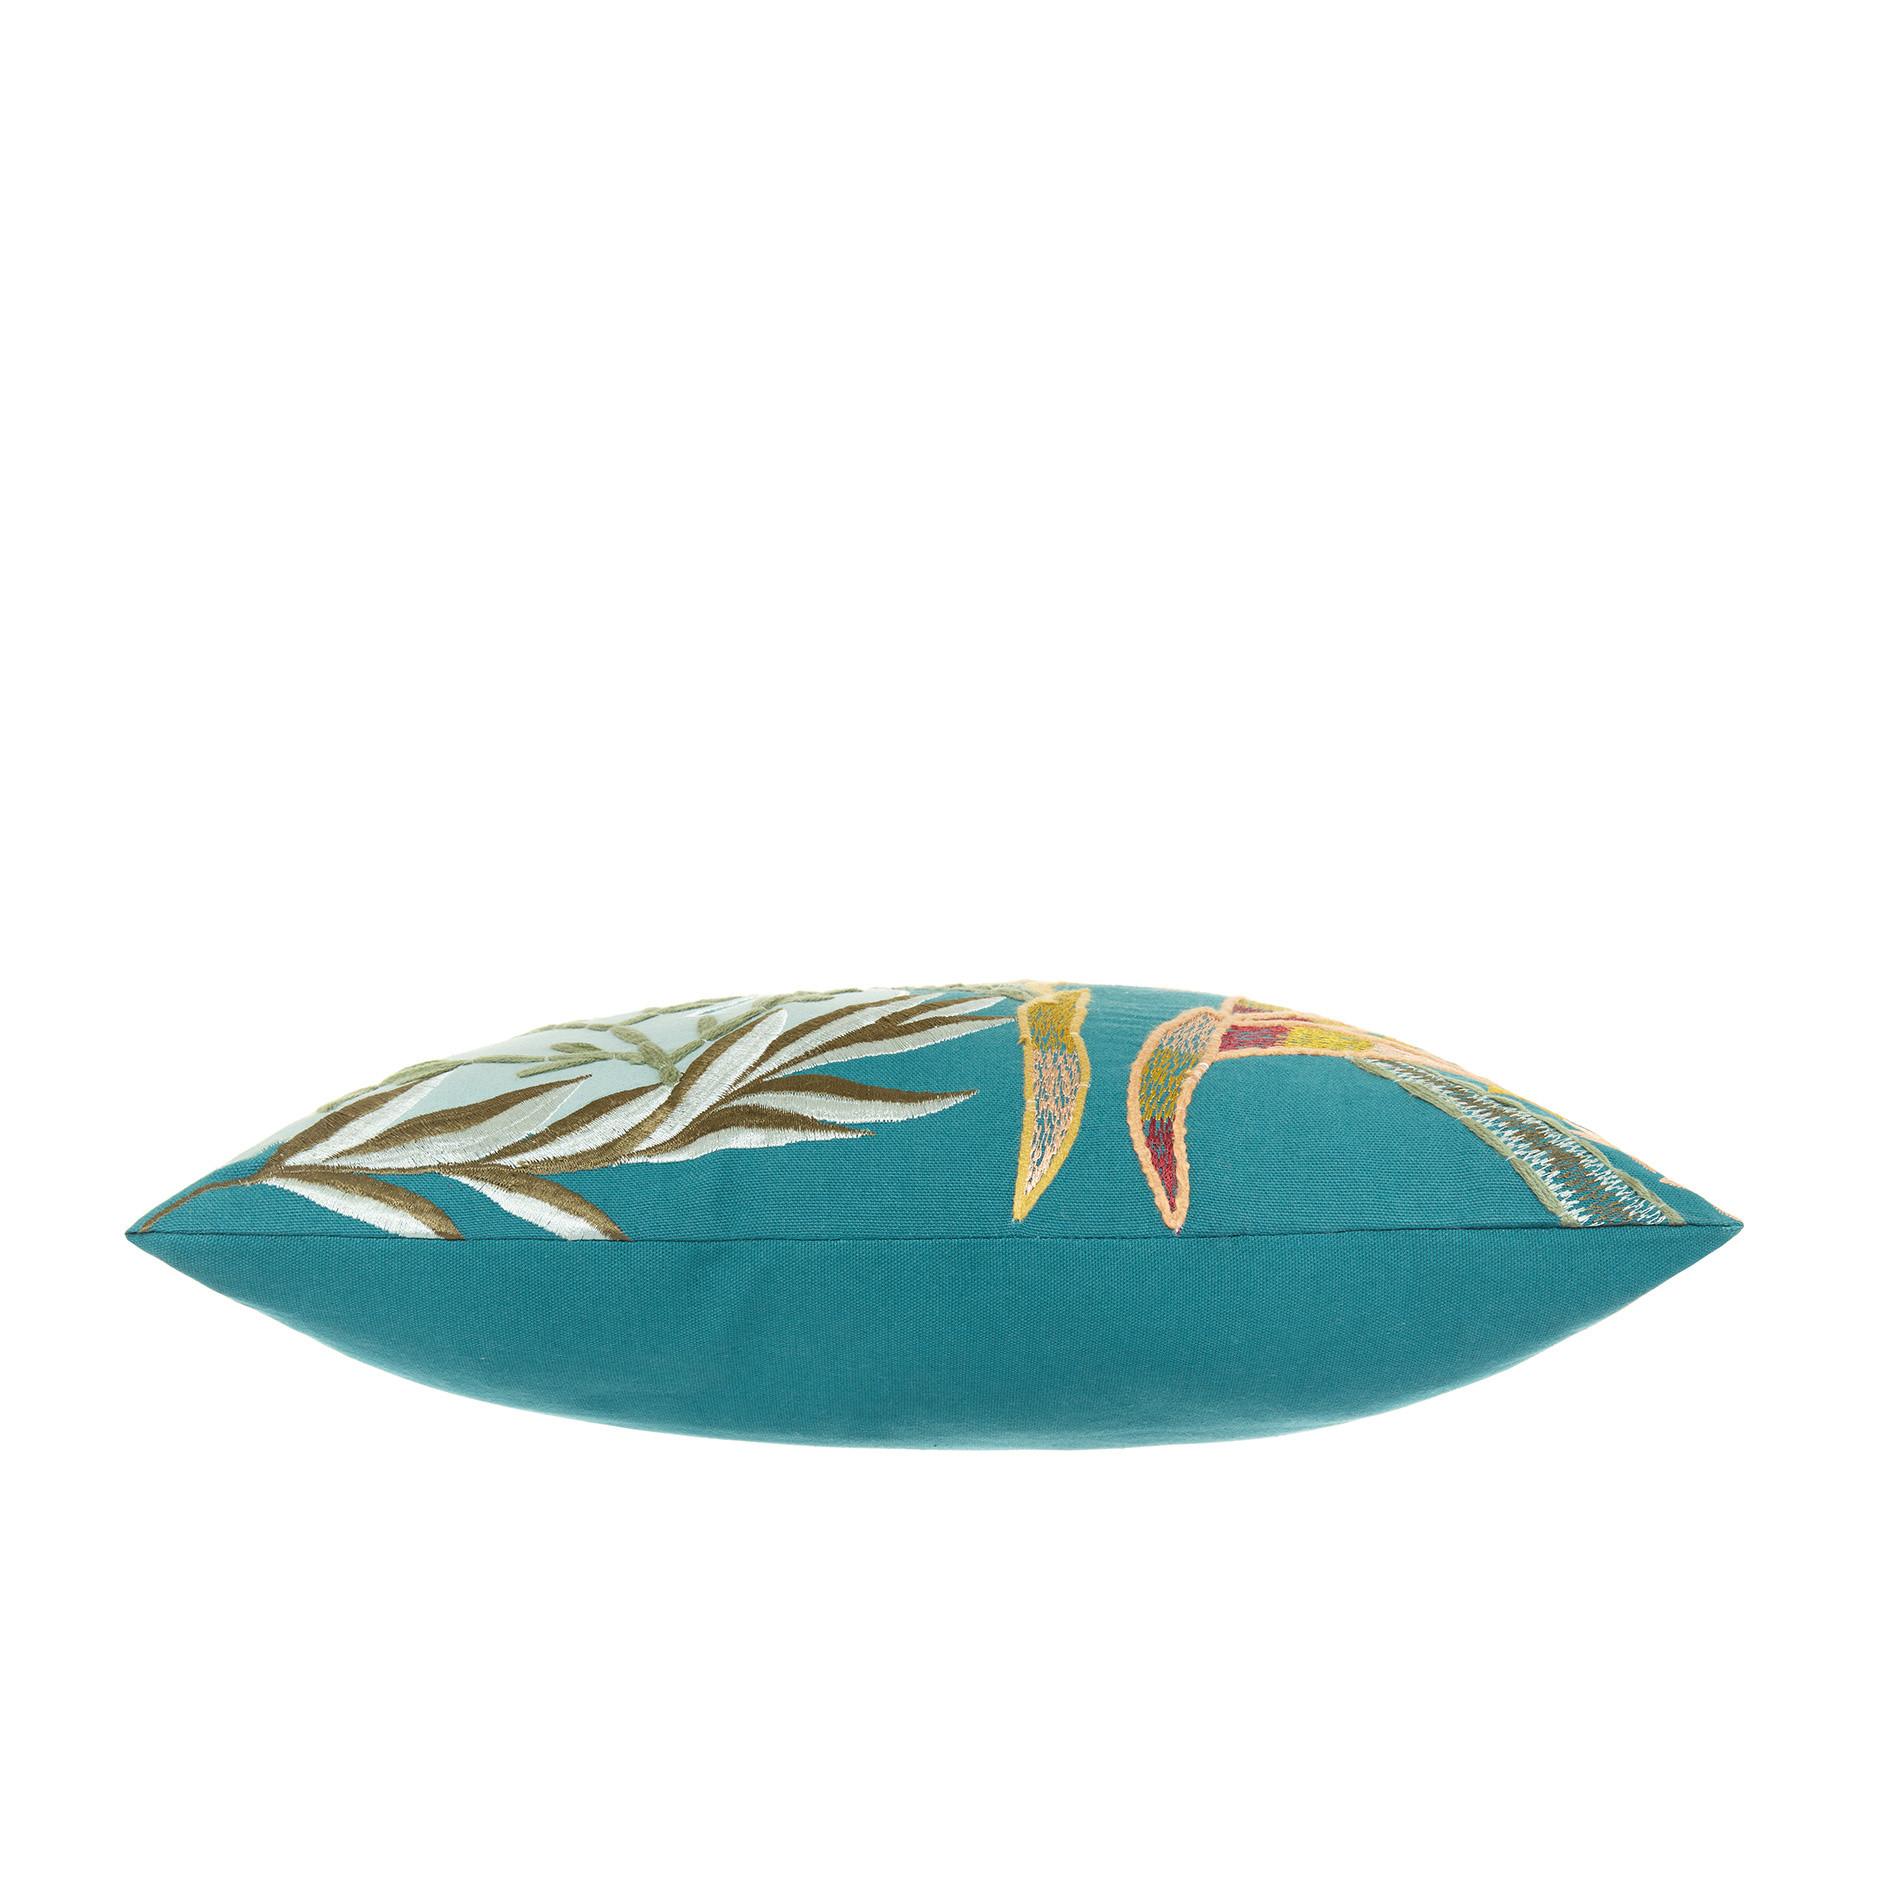 Cuscino ricamo foglie 45x45cm, Verde smeraldo, large image number 2